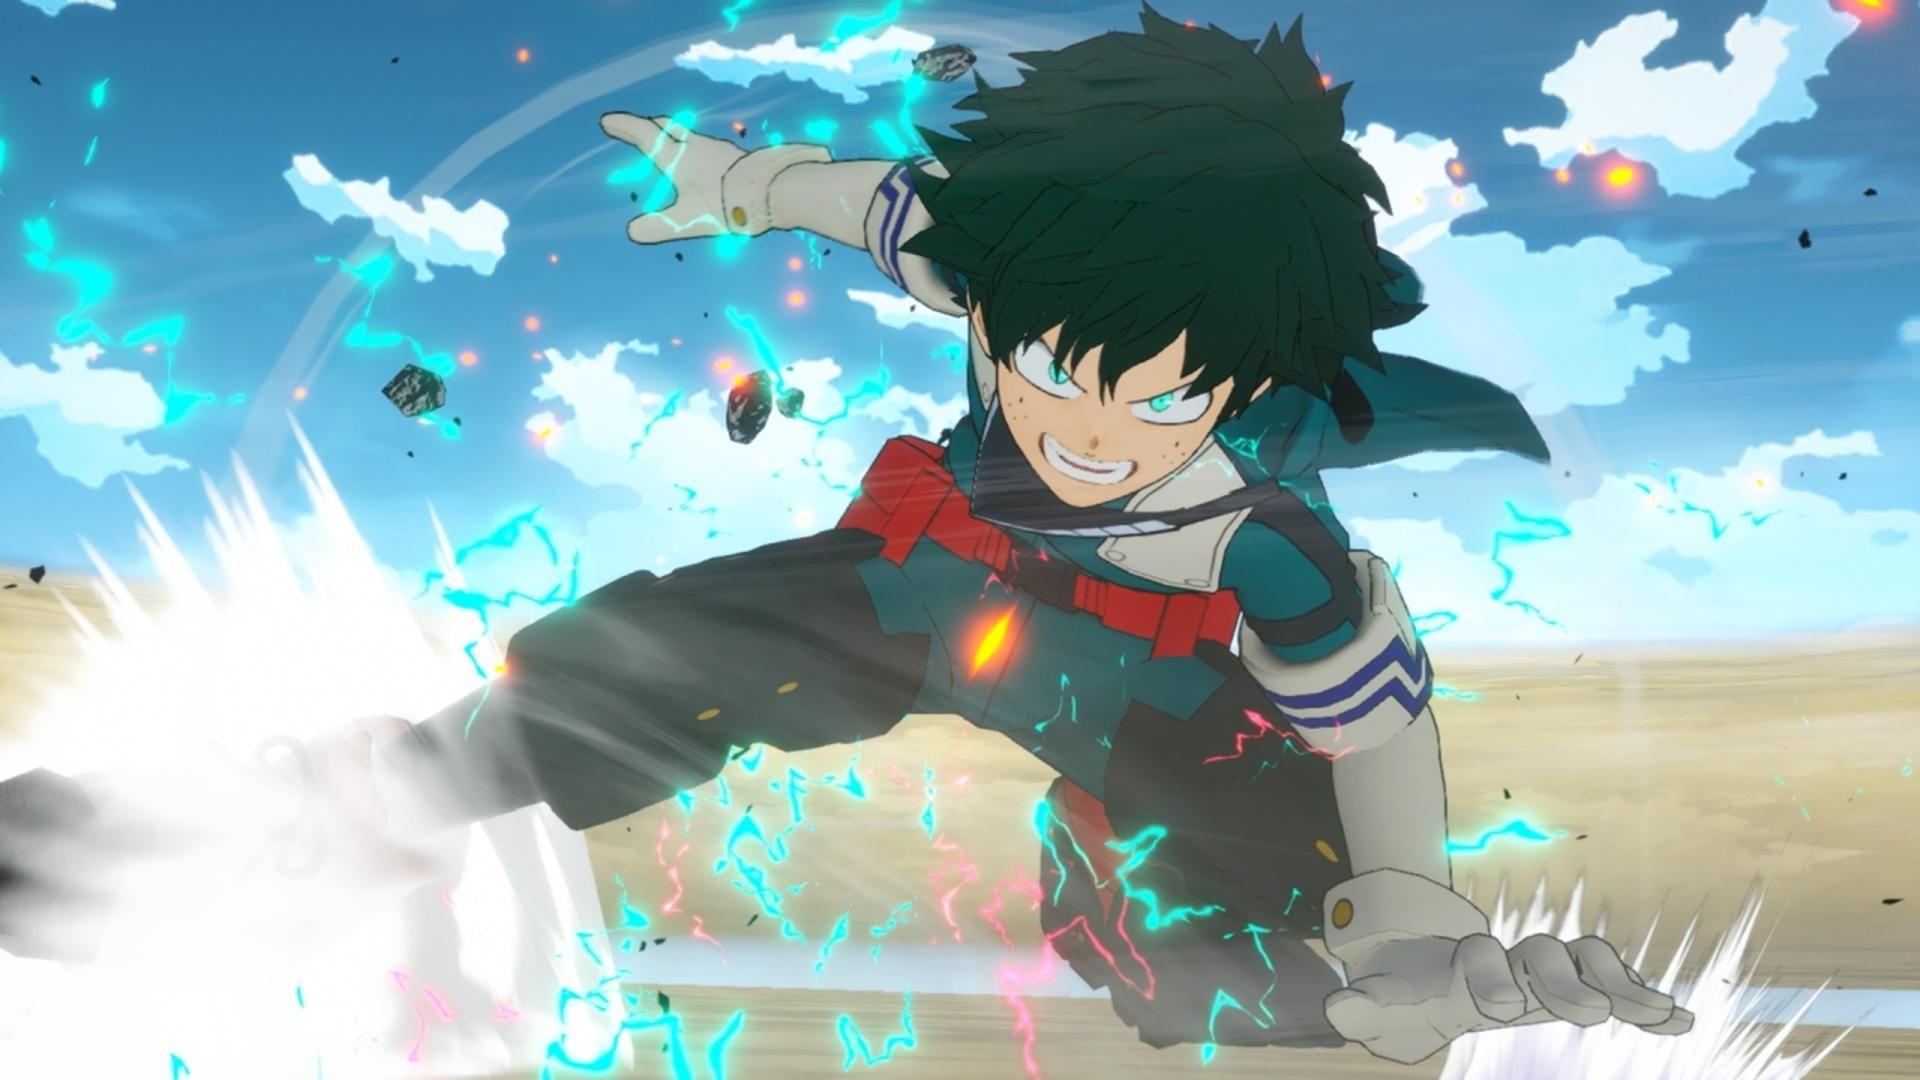 My Hero Academia Season 4 Episode 1 English Dubbed Online Hd Anime Wallpapers Anime Wallpaper My Hero